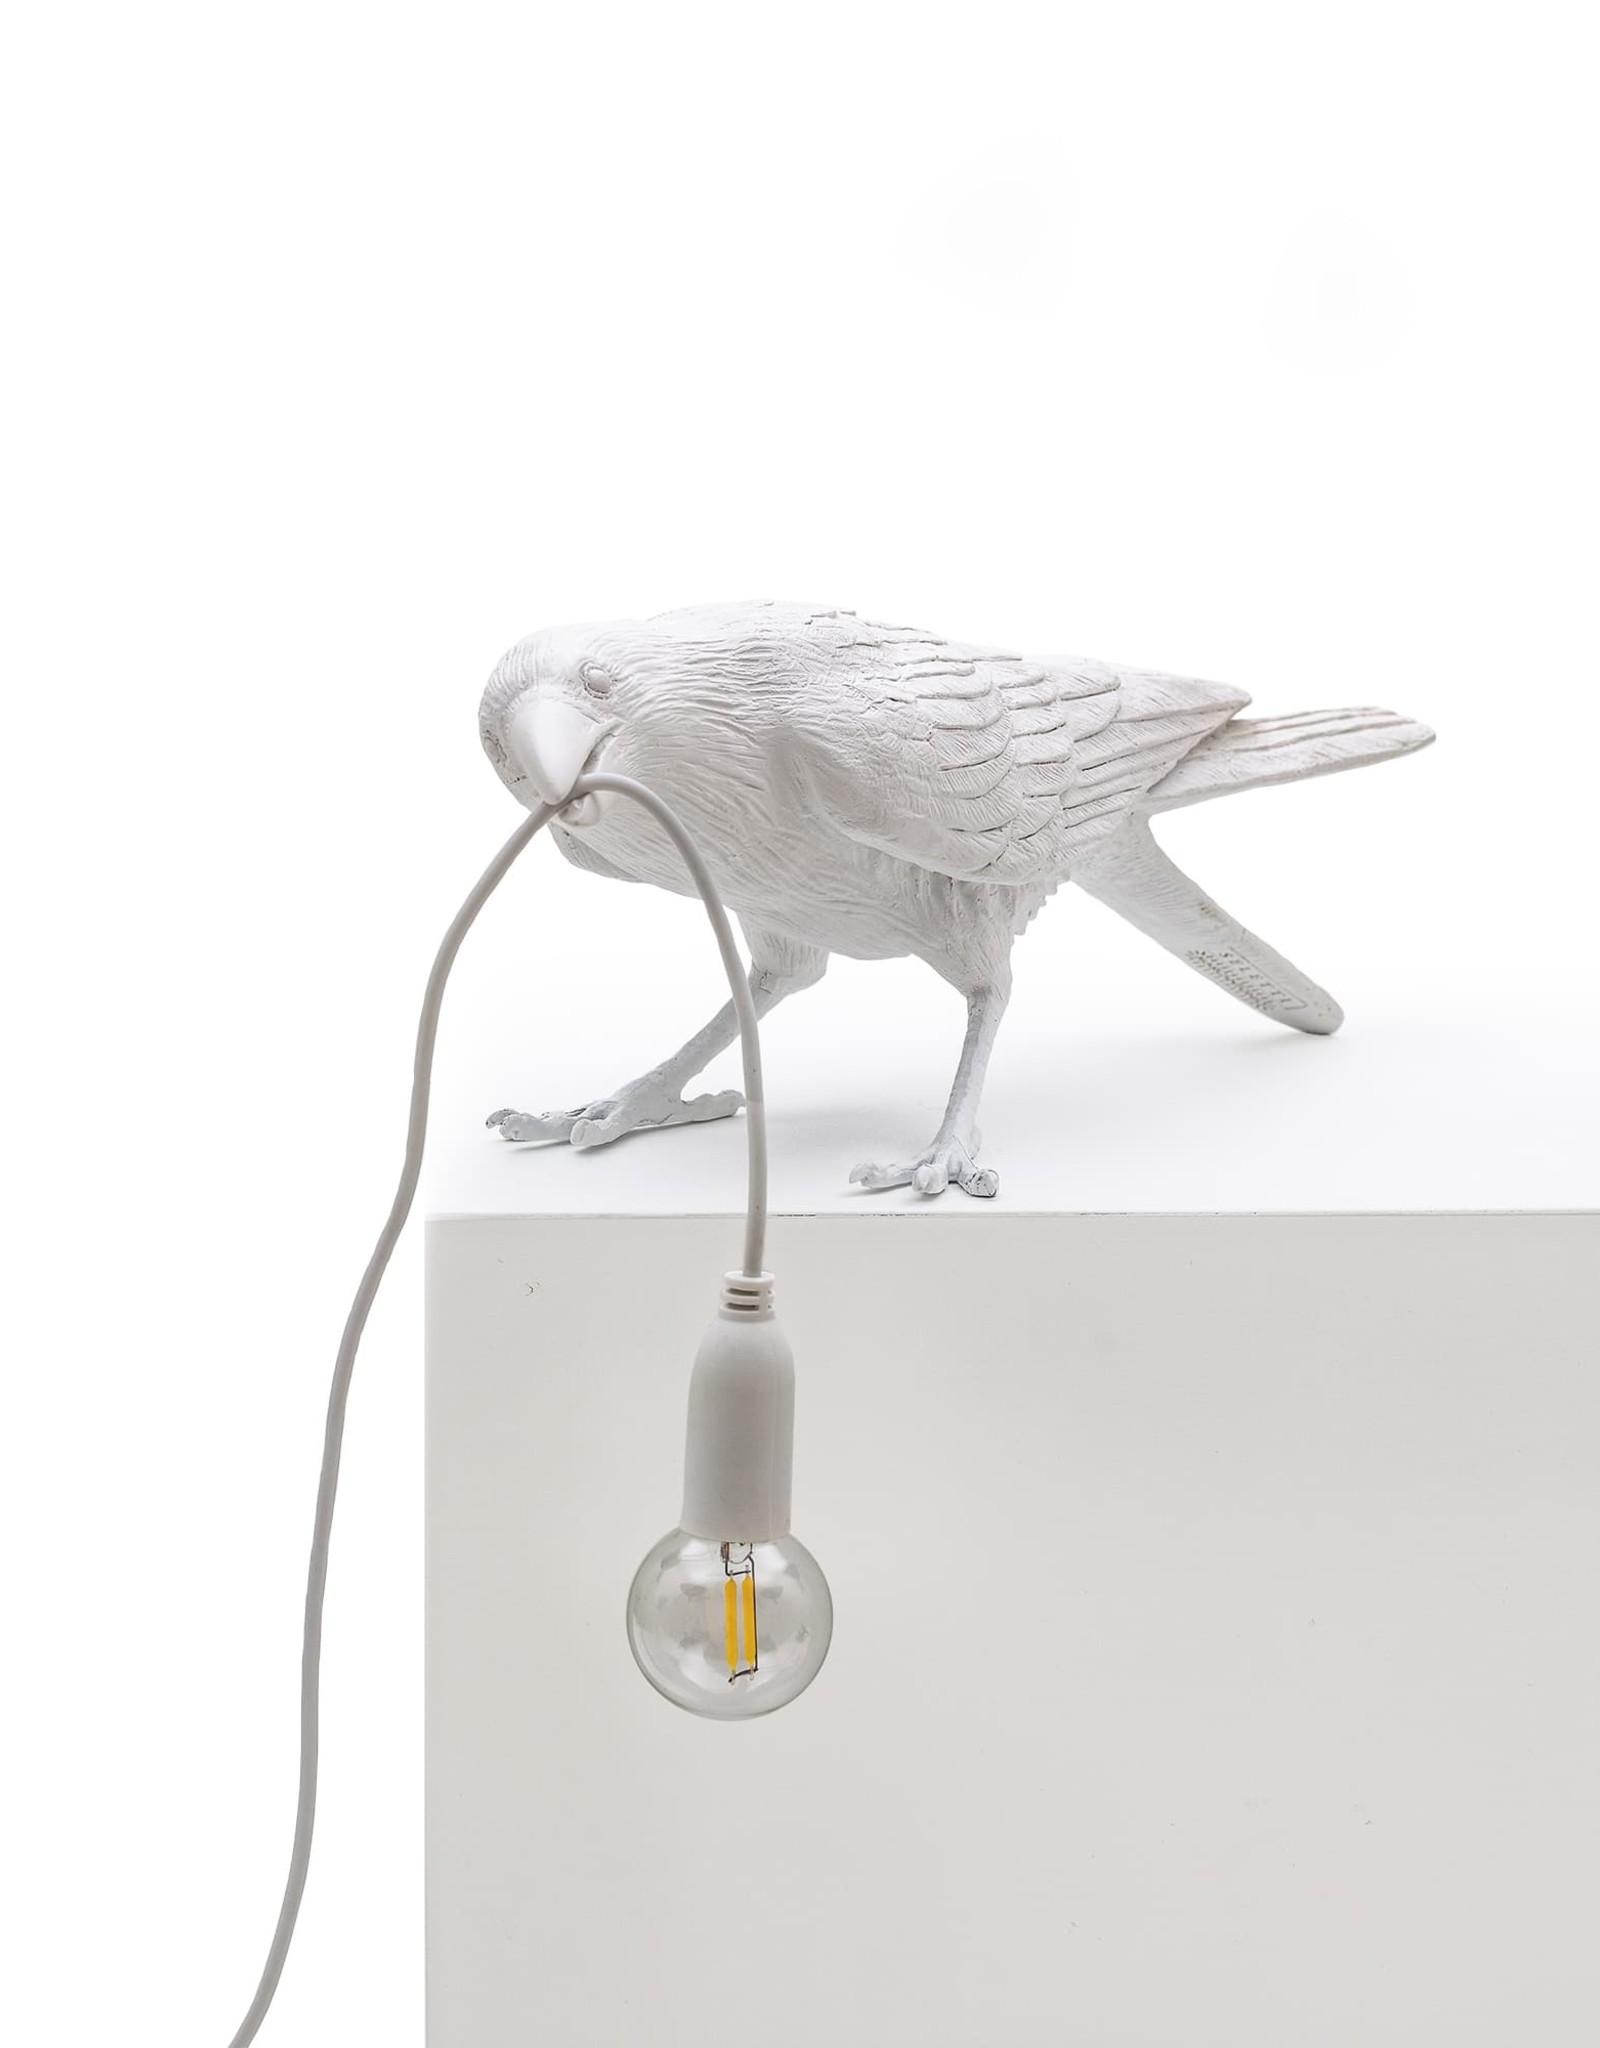 Seletti BIRD LAMP   - PLAYING  -WHITE